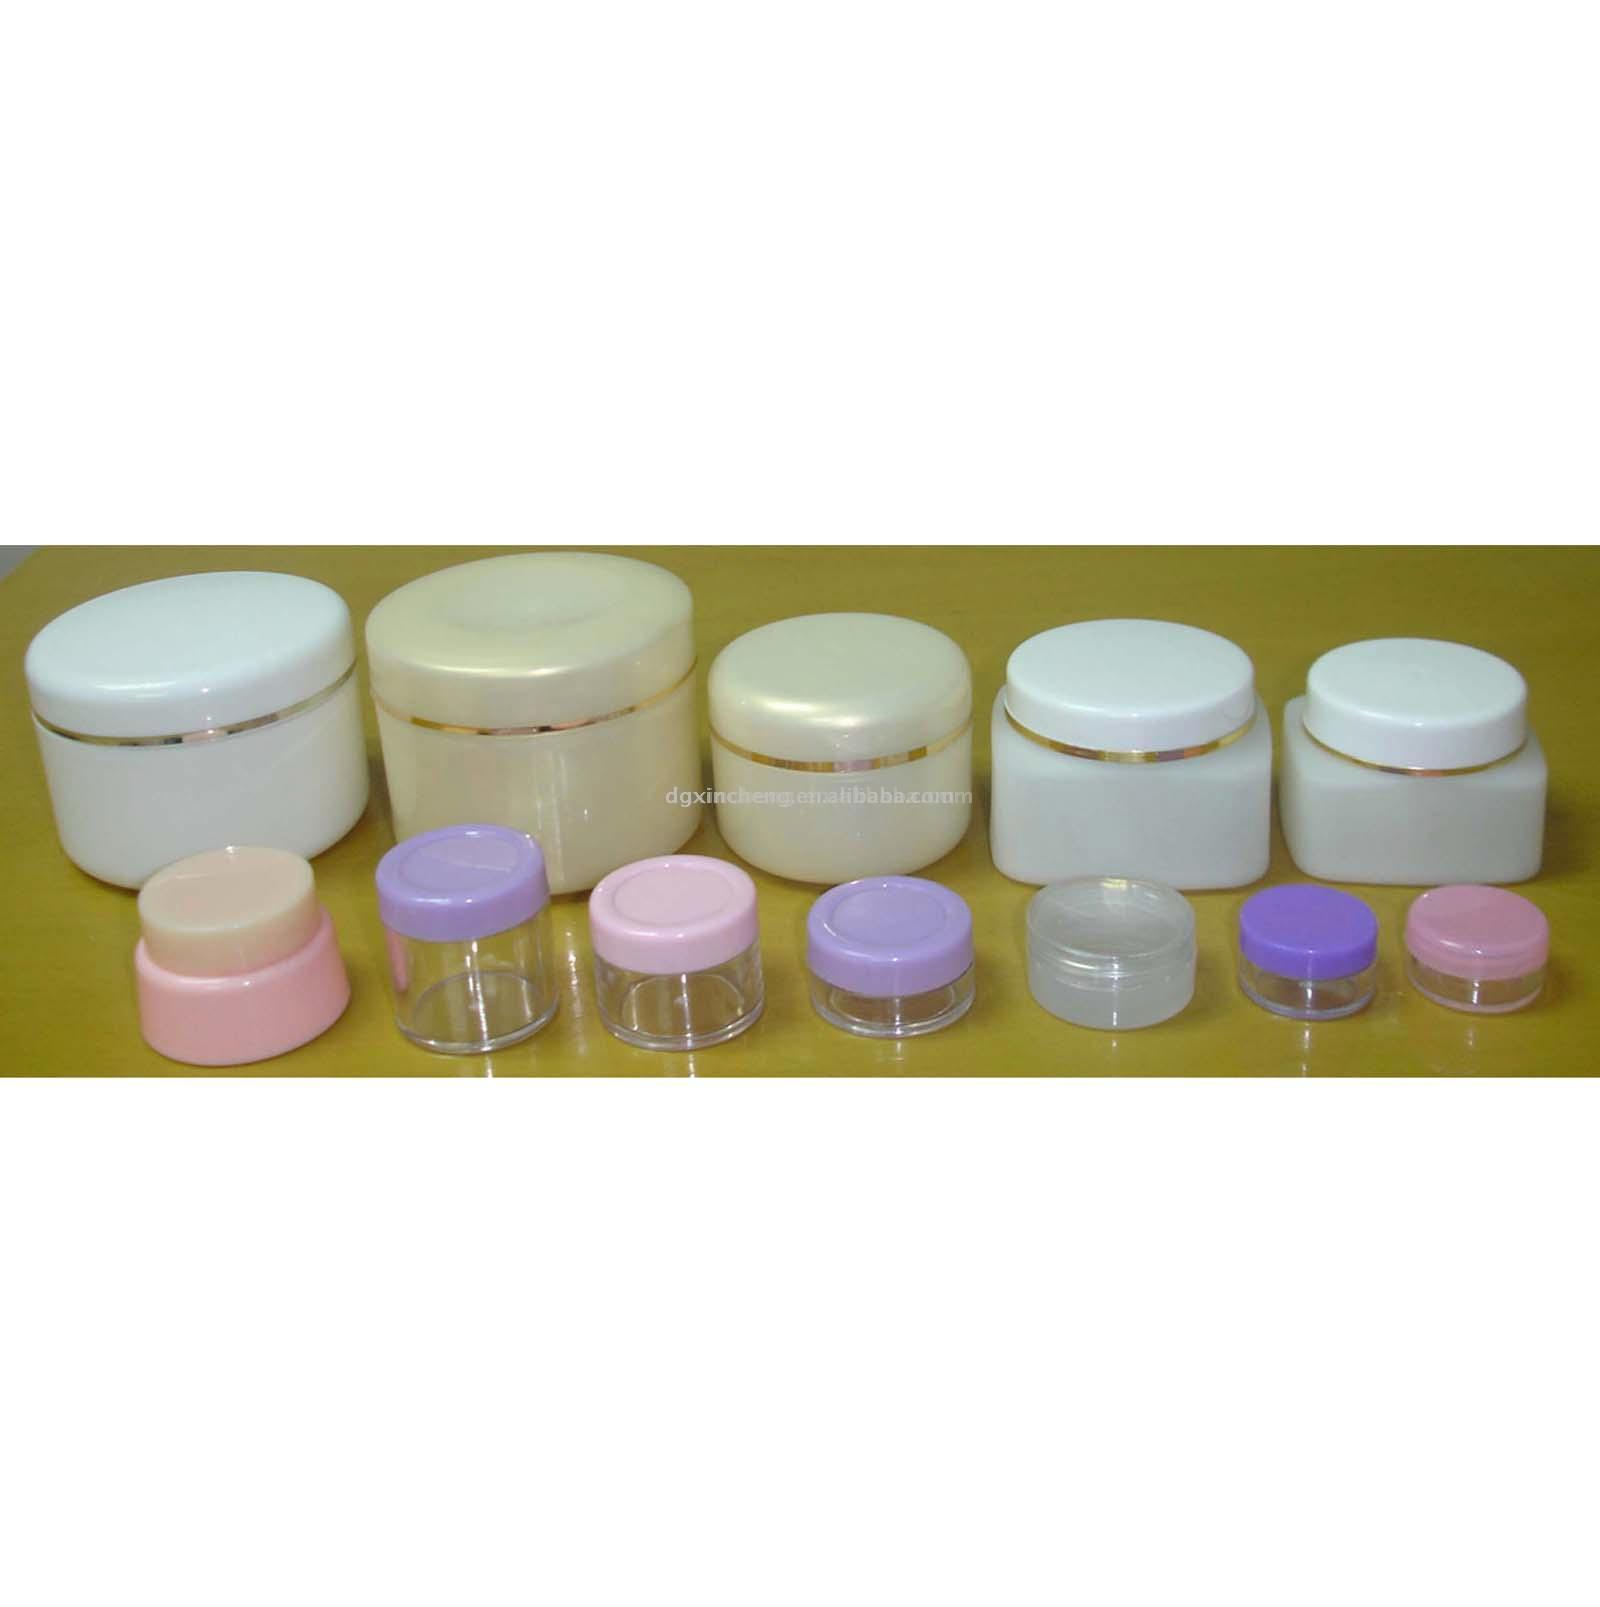 cosmetic-helesay-11